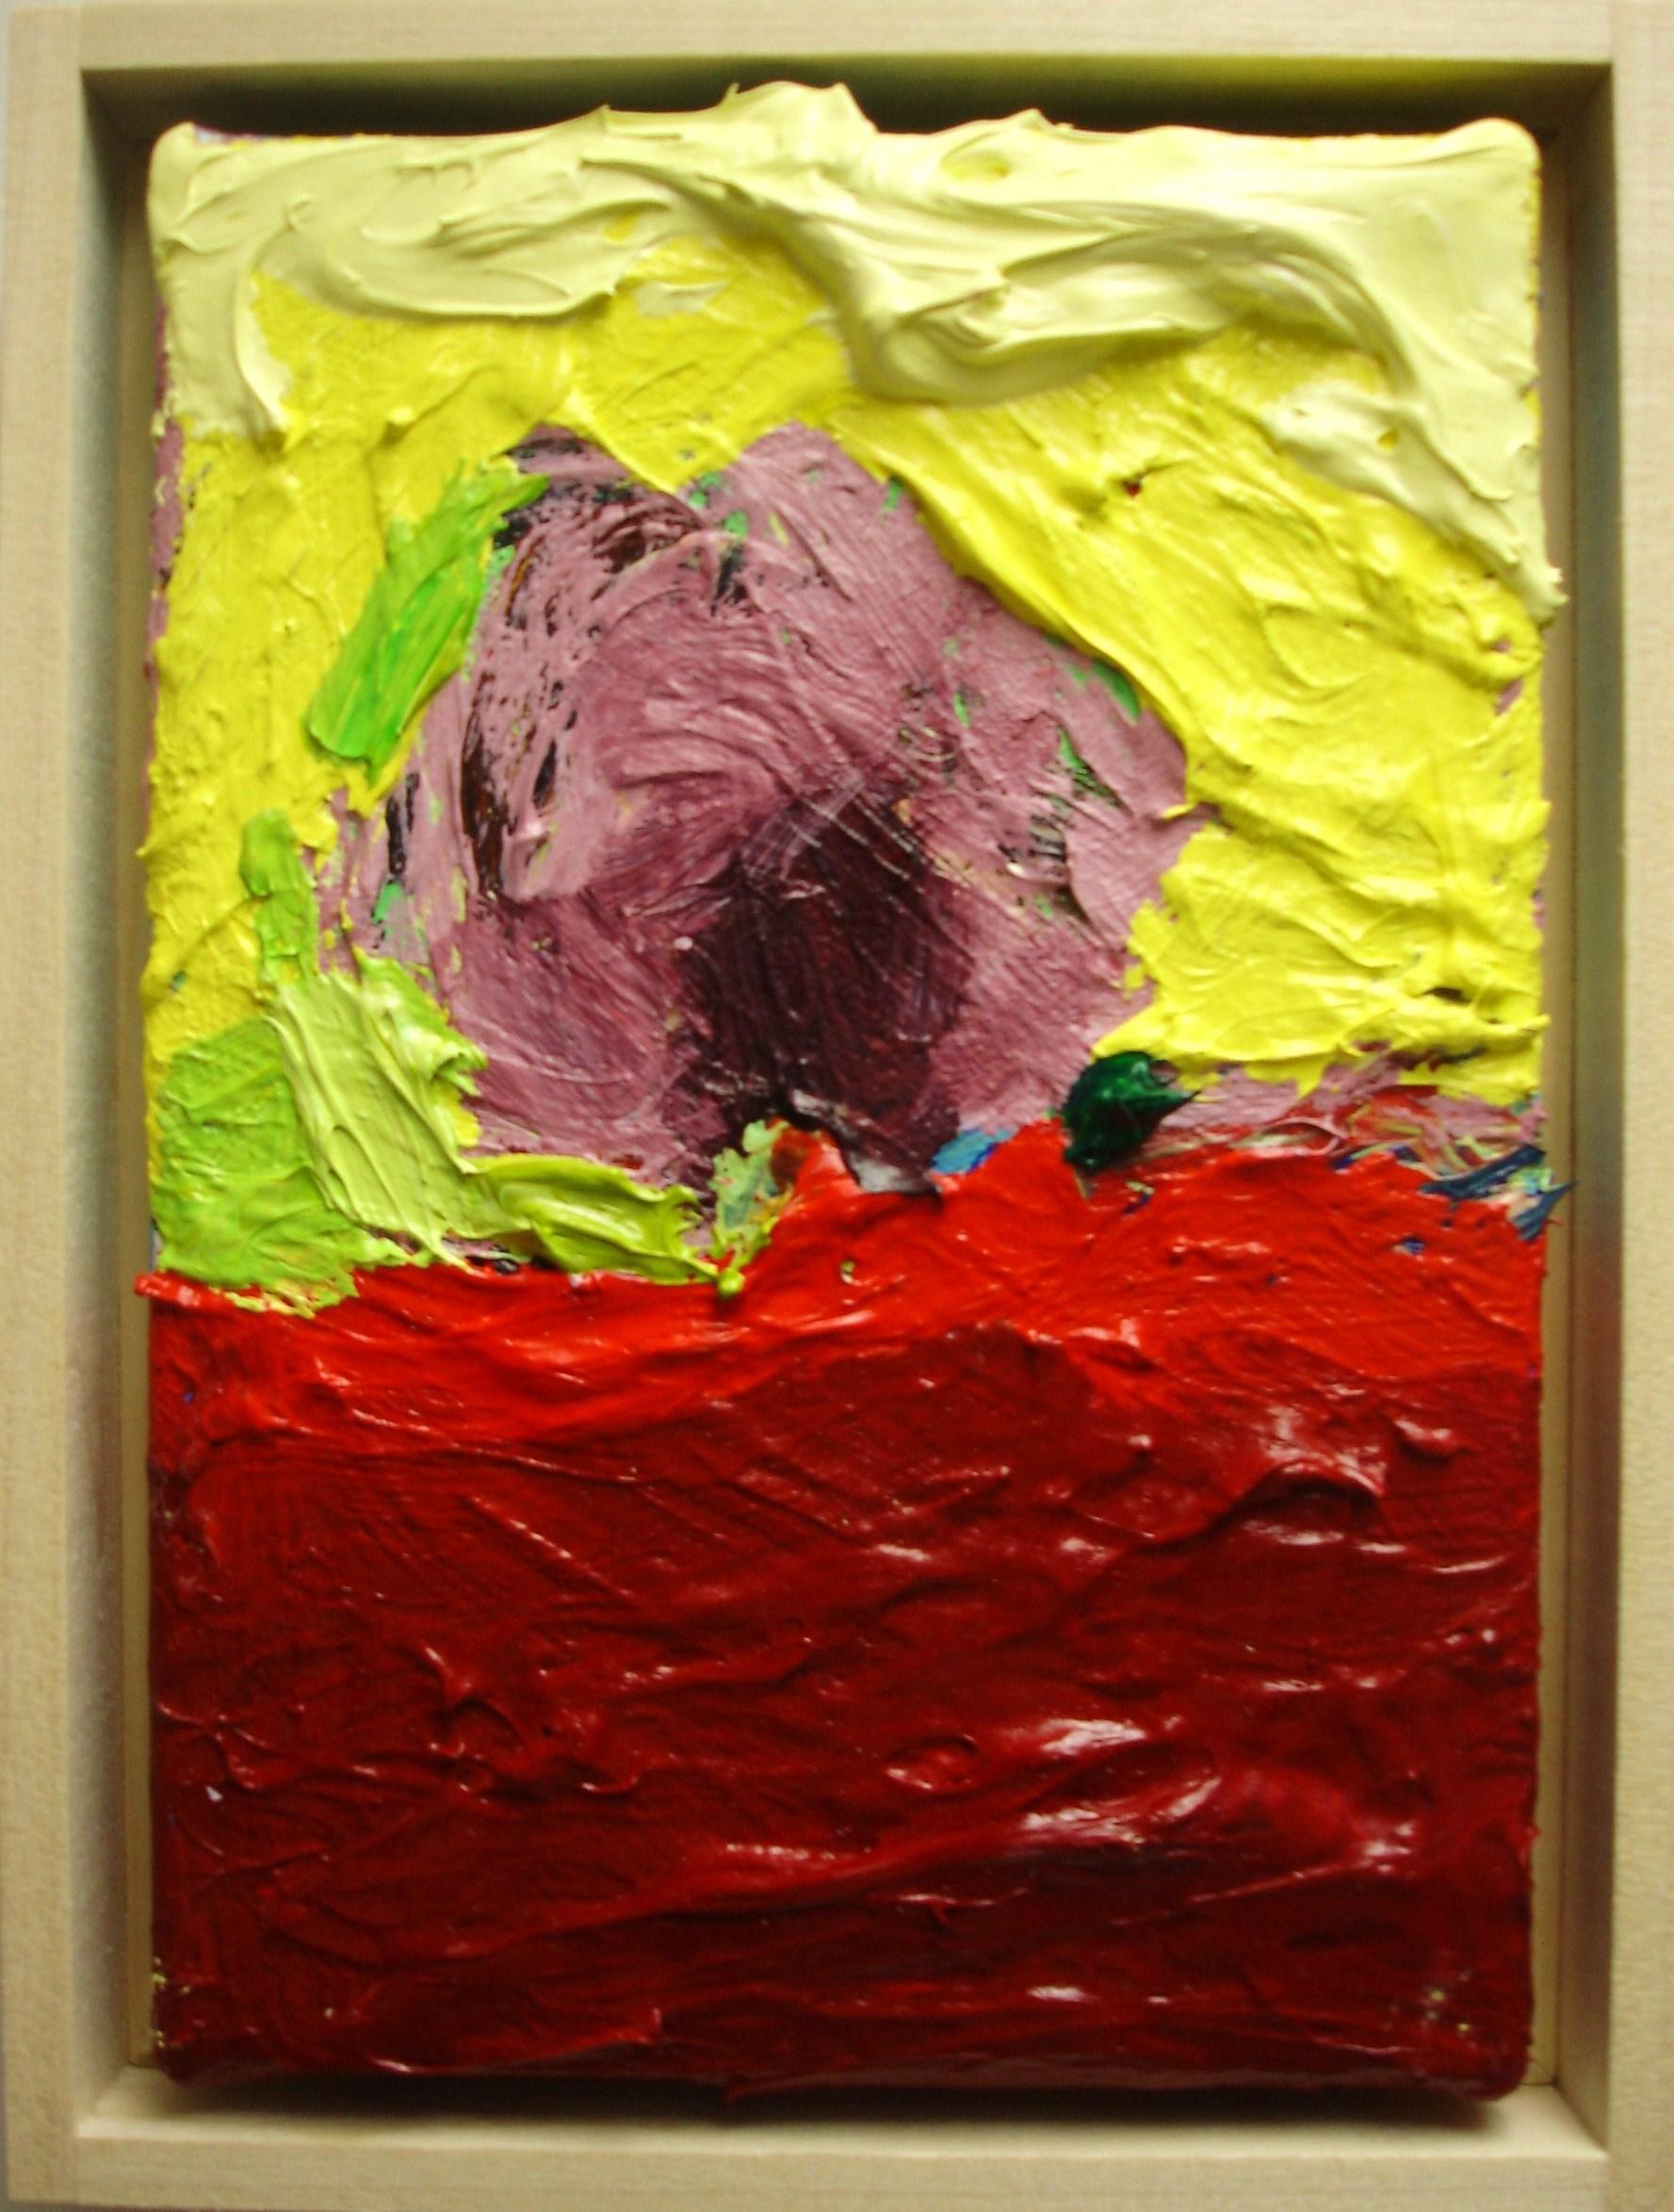 14 mattlewis-red, yellow, light yellow-#1